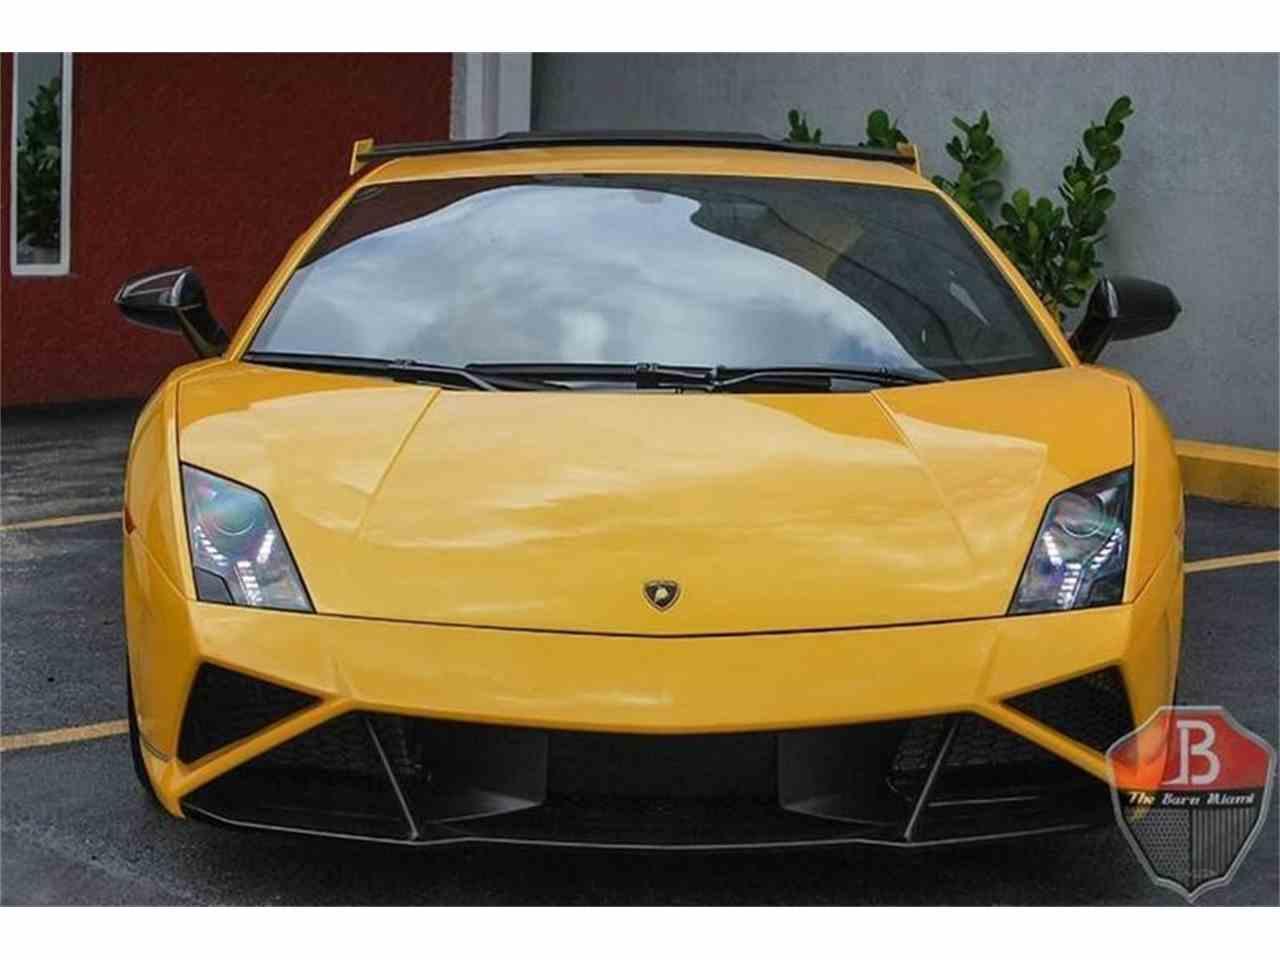 Large Picture of 2014 Gallardo Squadra Corse located in Miami Florida - $244,900.00 Offered by The Barn Miami - IRP5